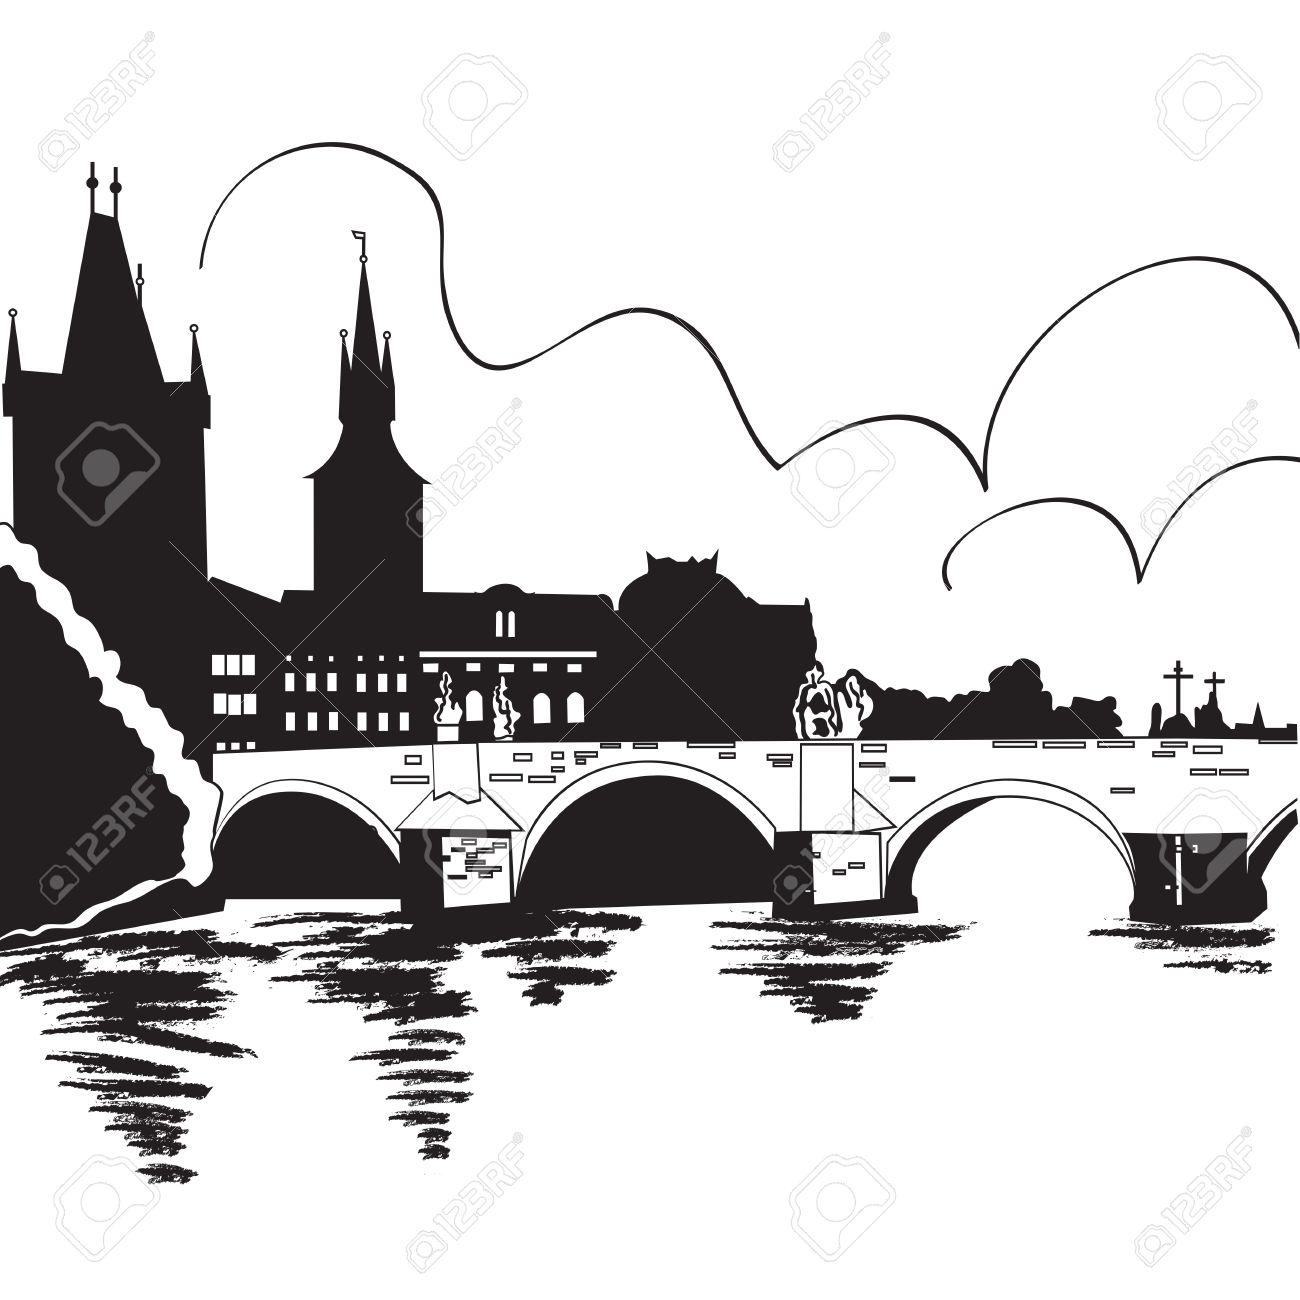 Charles Bridge Royalty Free Cliparts, Vectors, And Stock.